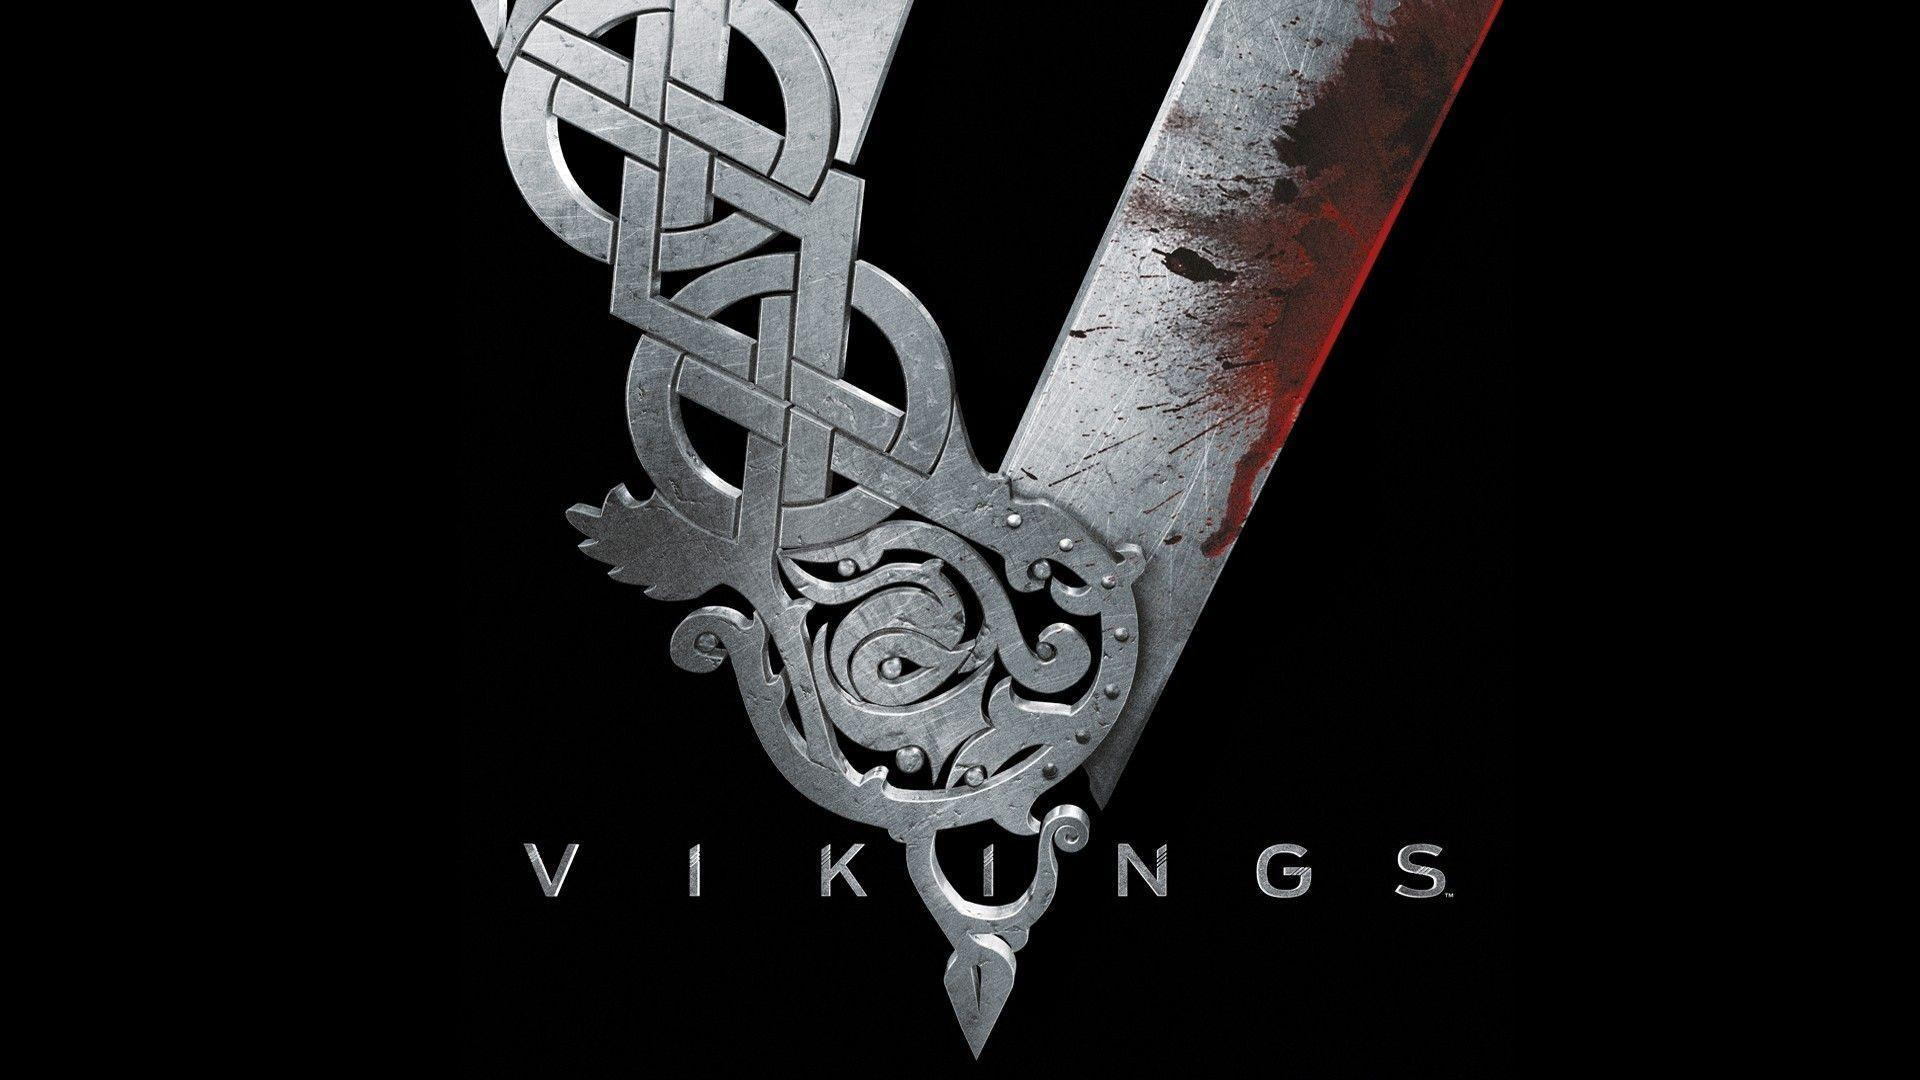 Vikings TV Show HD Wallpaper #2369 | Frenzia.com